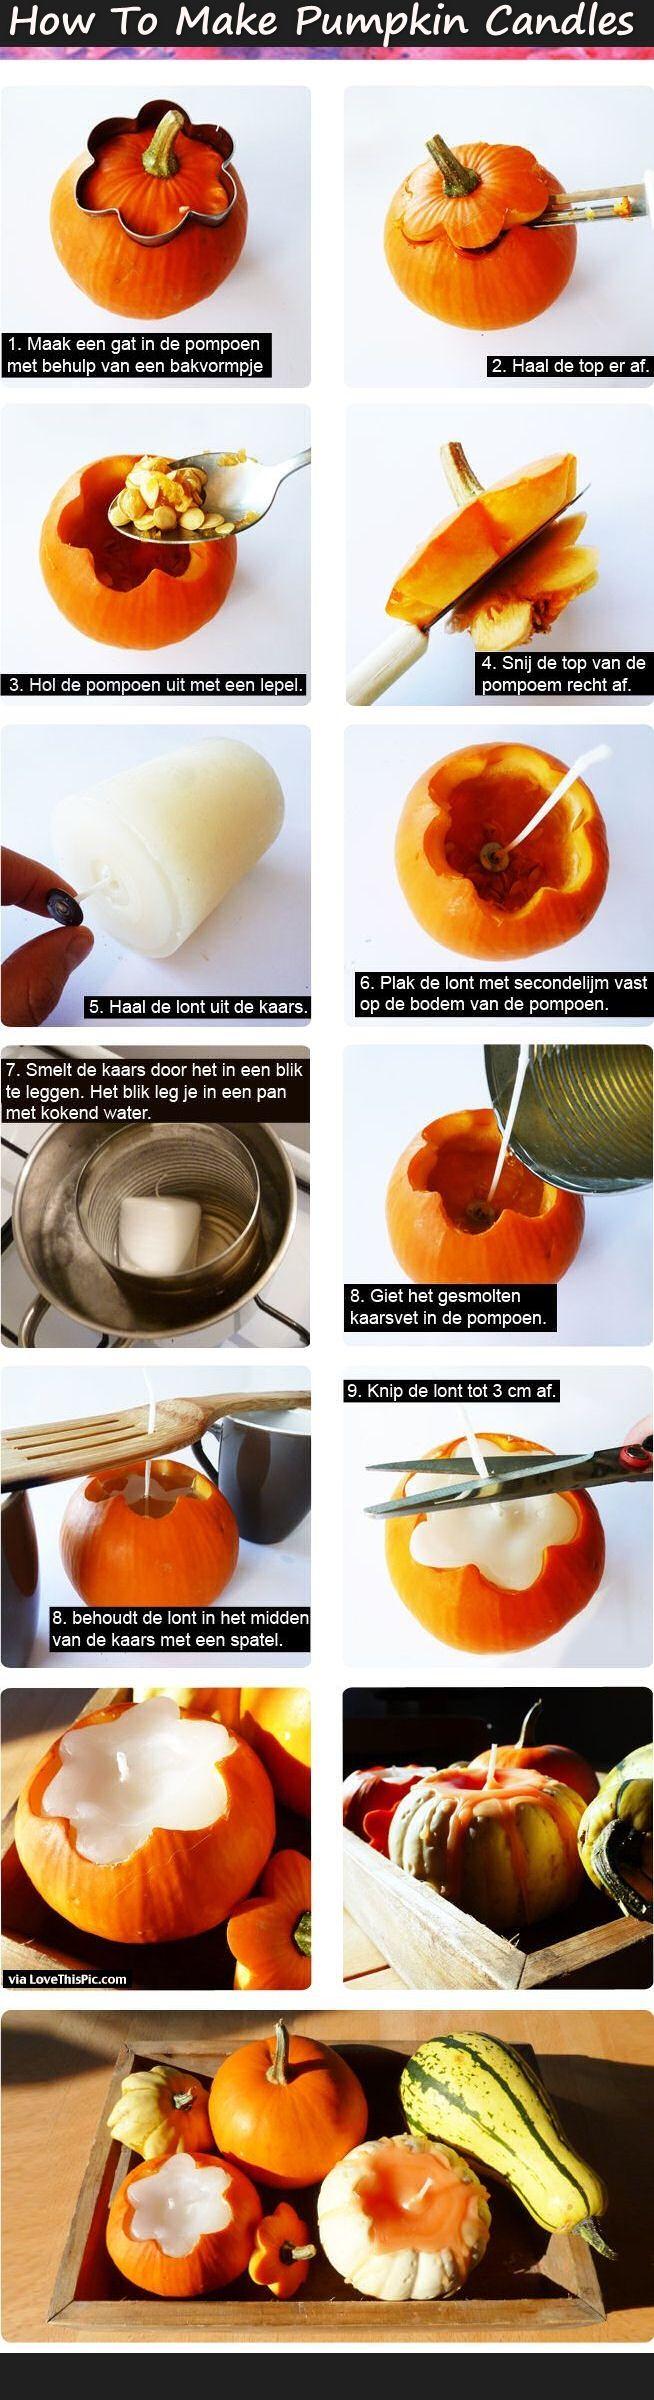 All Created - Pumpkin Candles